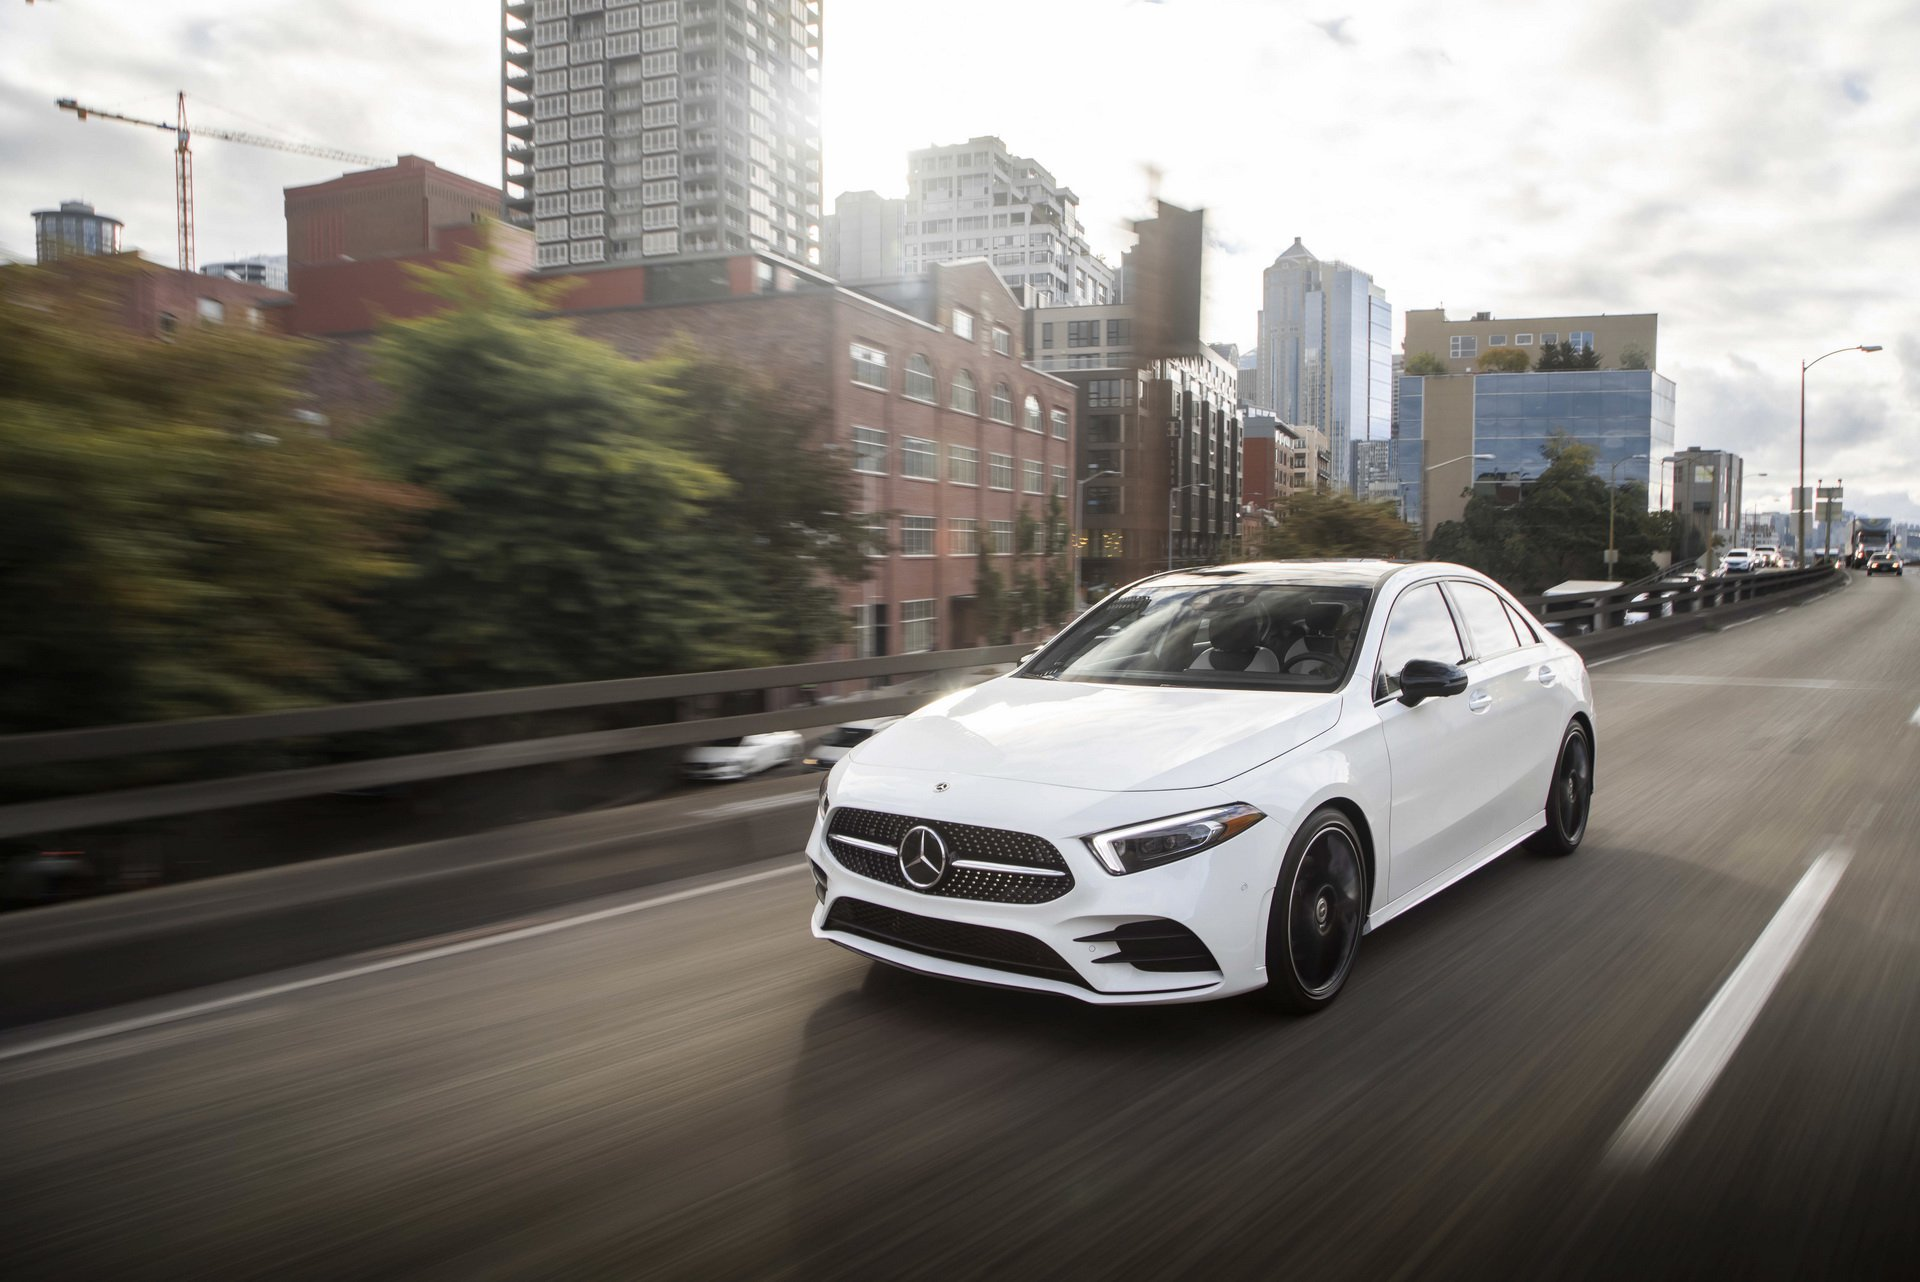 mercedesbenz showcases 2019 aclass sedan for us market